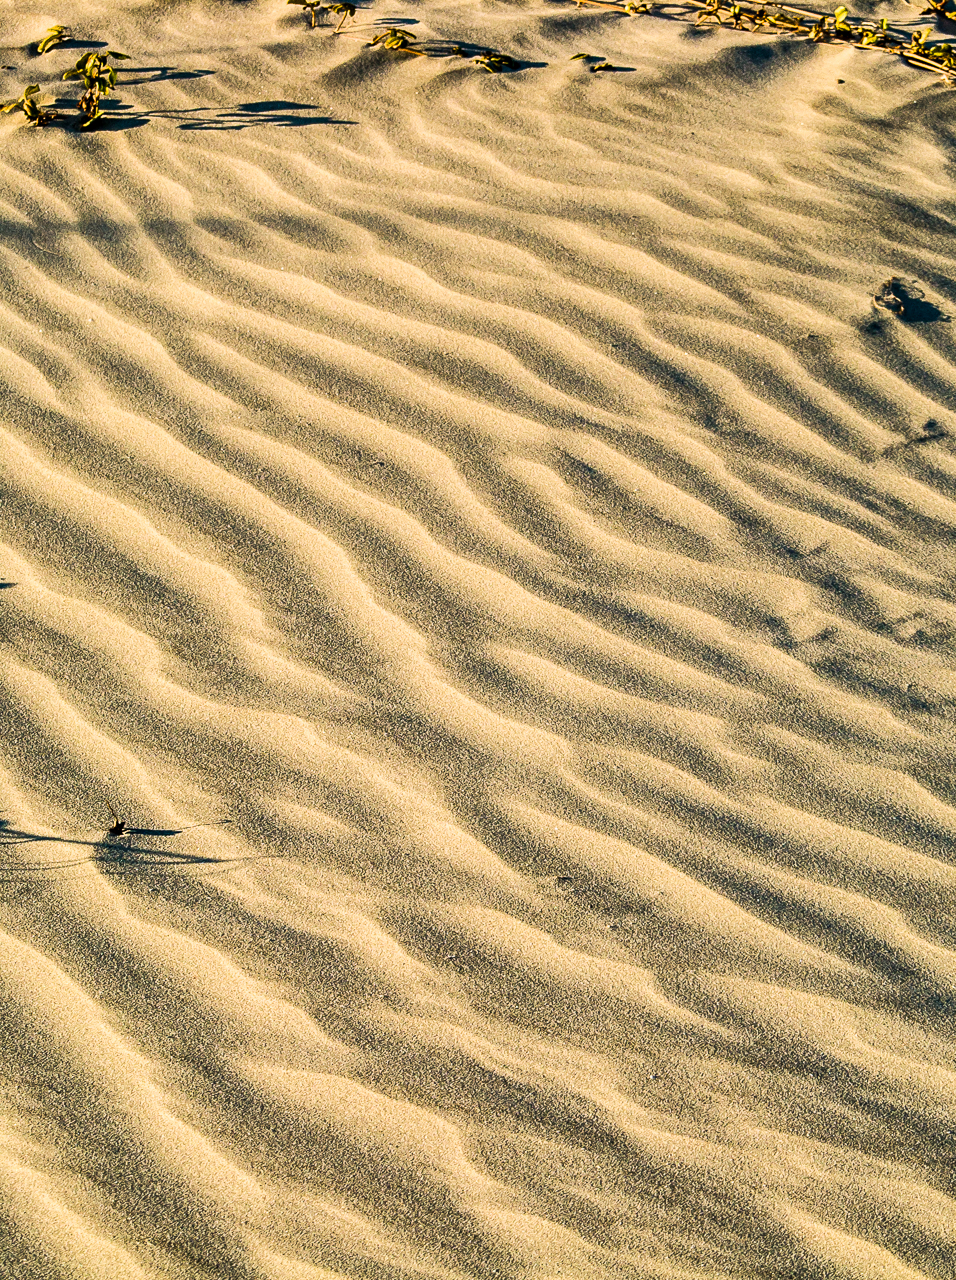 Phtograph of a sand dune at Jockey Ridge